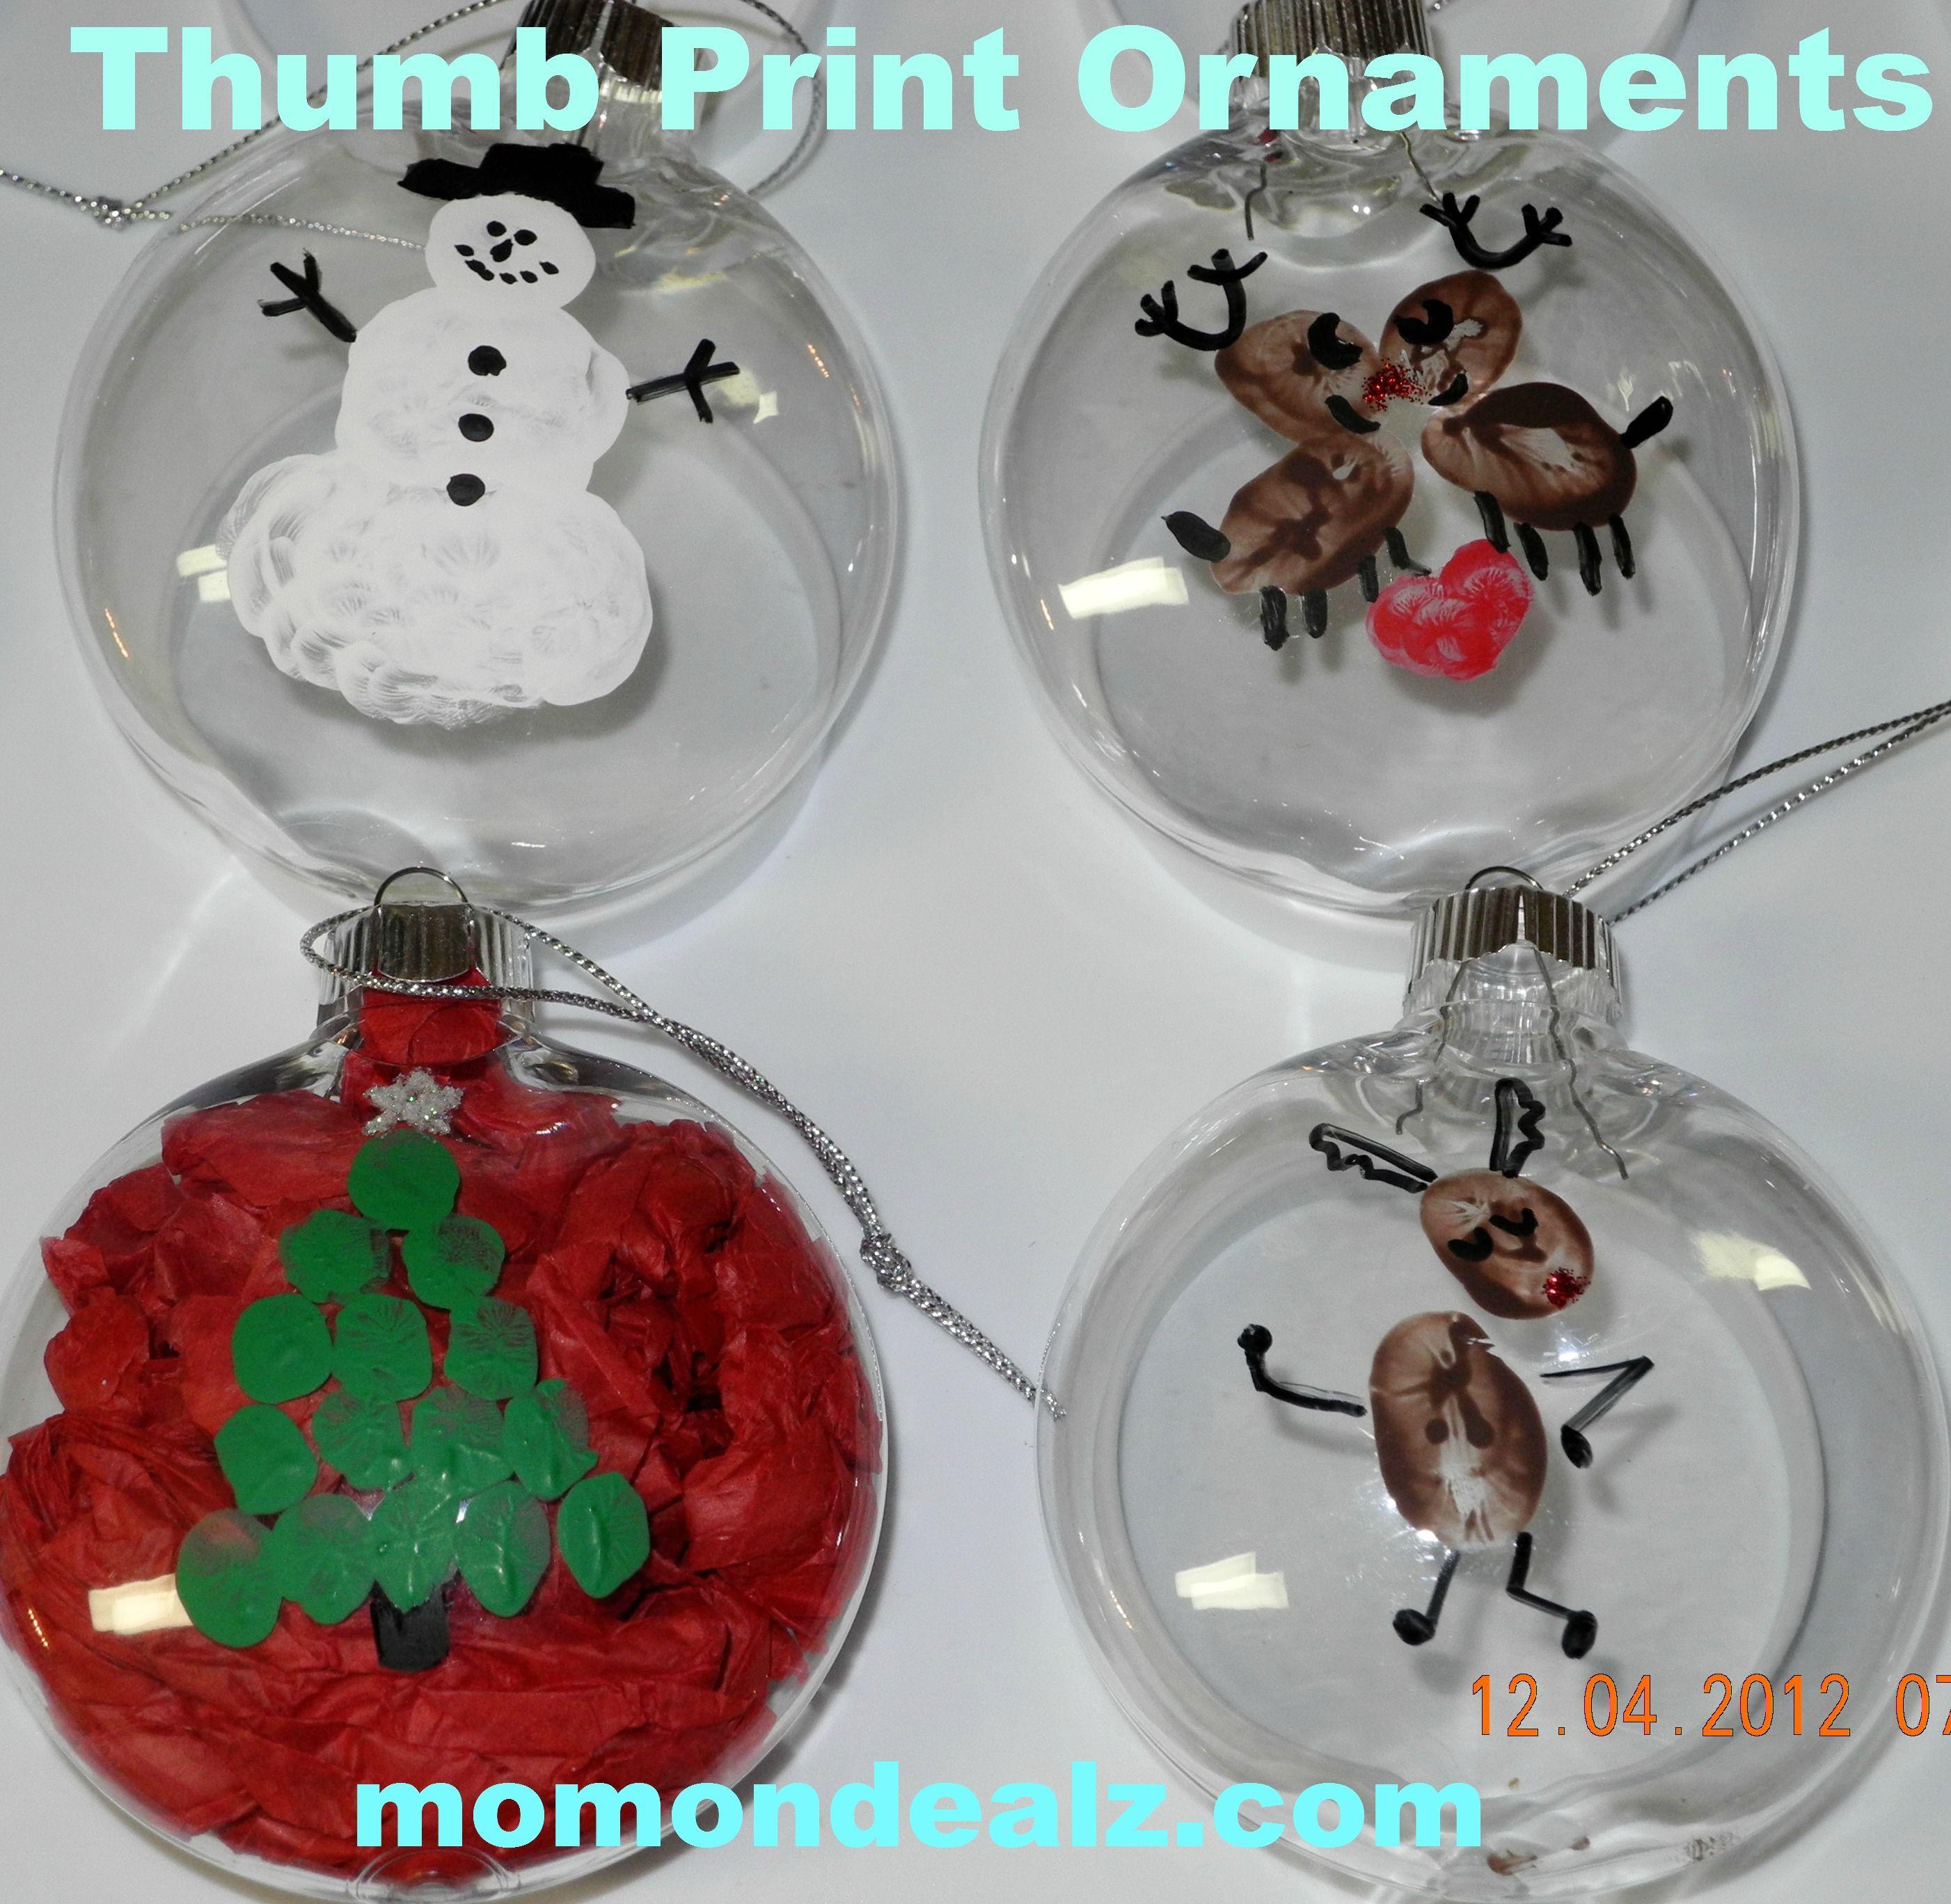 Preschool Christmas Ornament Craft Ideas  Thumb print ornaments ing maybe giving them a coat